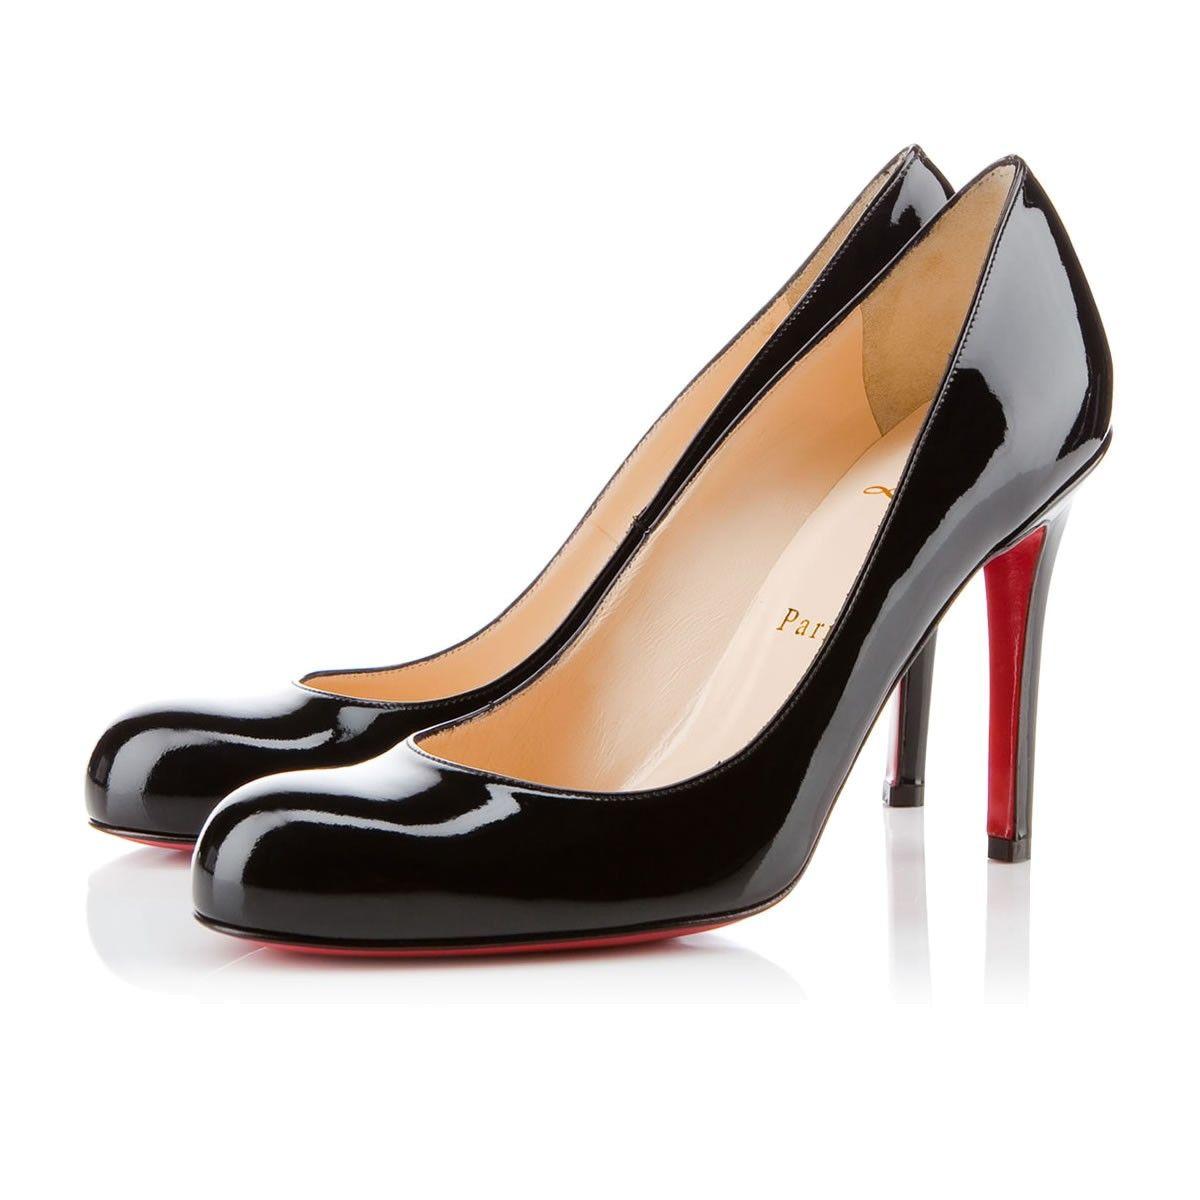 sports shoes 50e45 57a72 SIMPLE PUMP PATENT 100 Nude Patent calfskin - Women Shoes ...